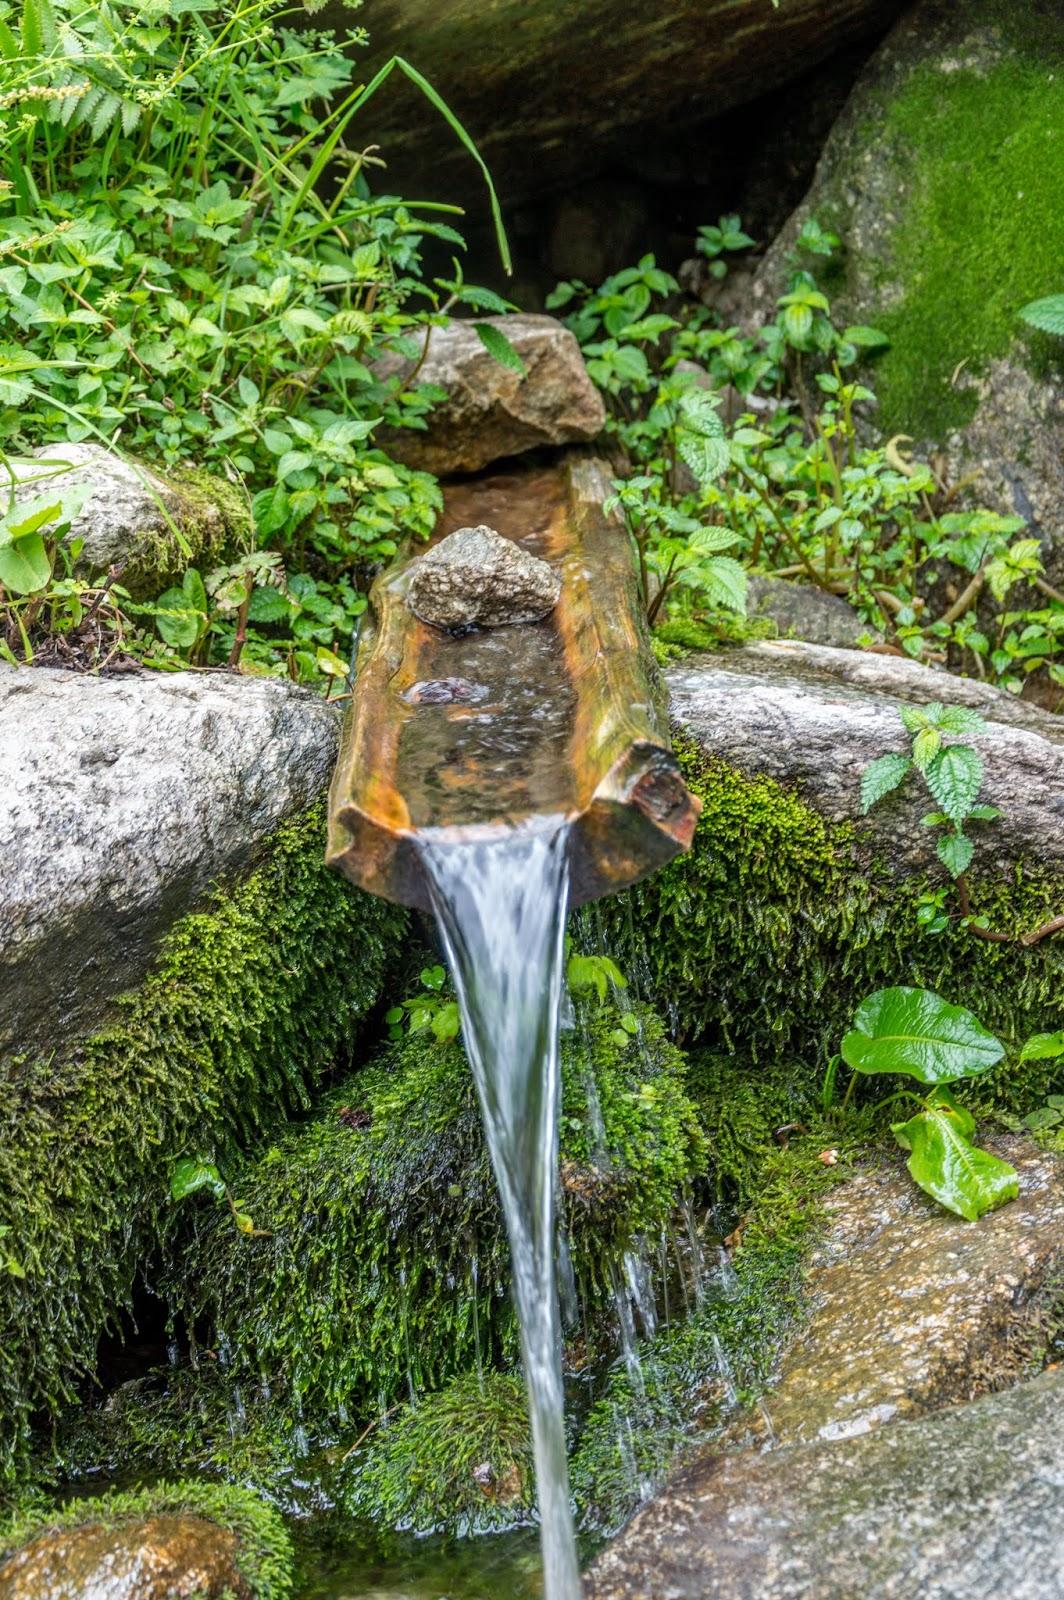 spring water channelised in a very innovative way near Singhaad village en route Srikhand Mahadev Yatra